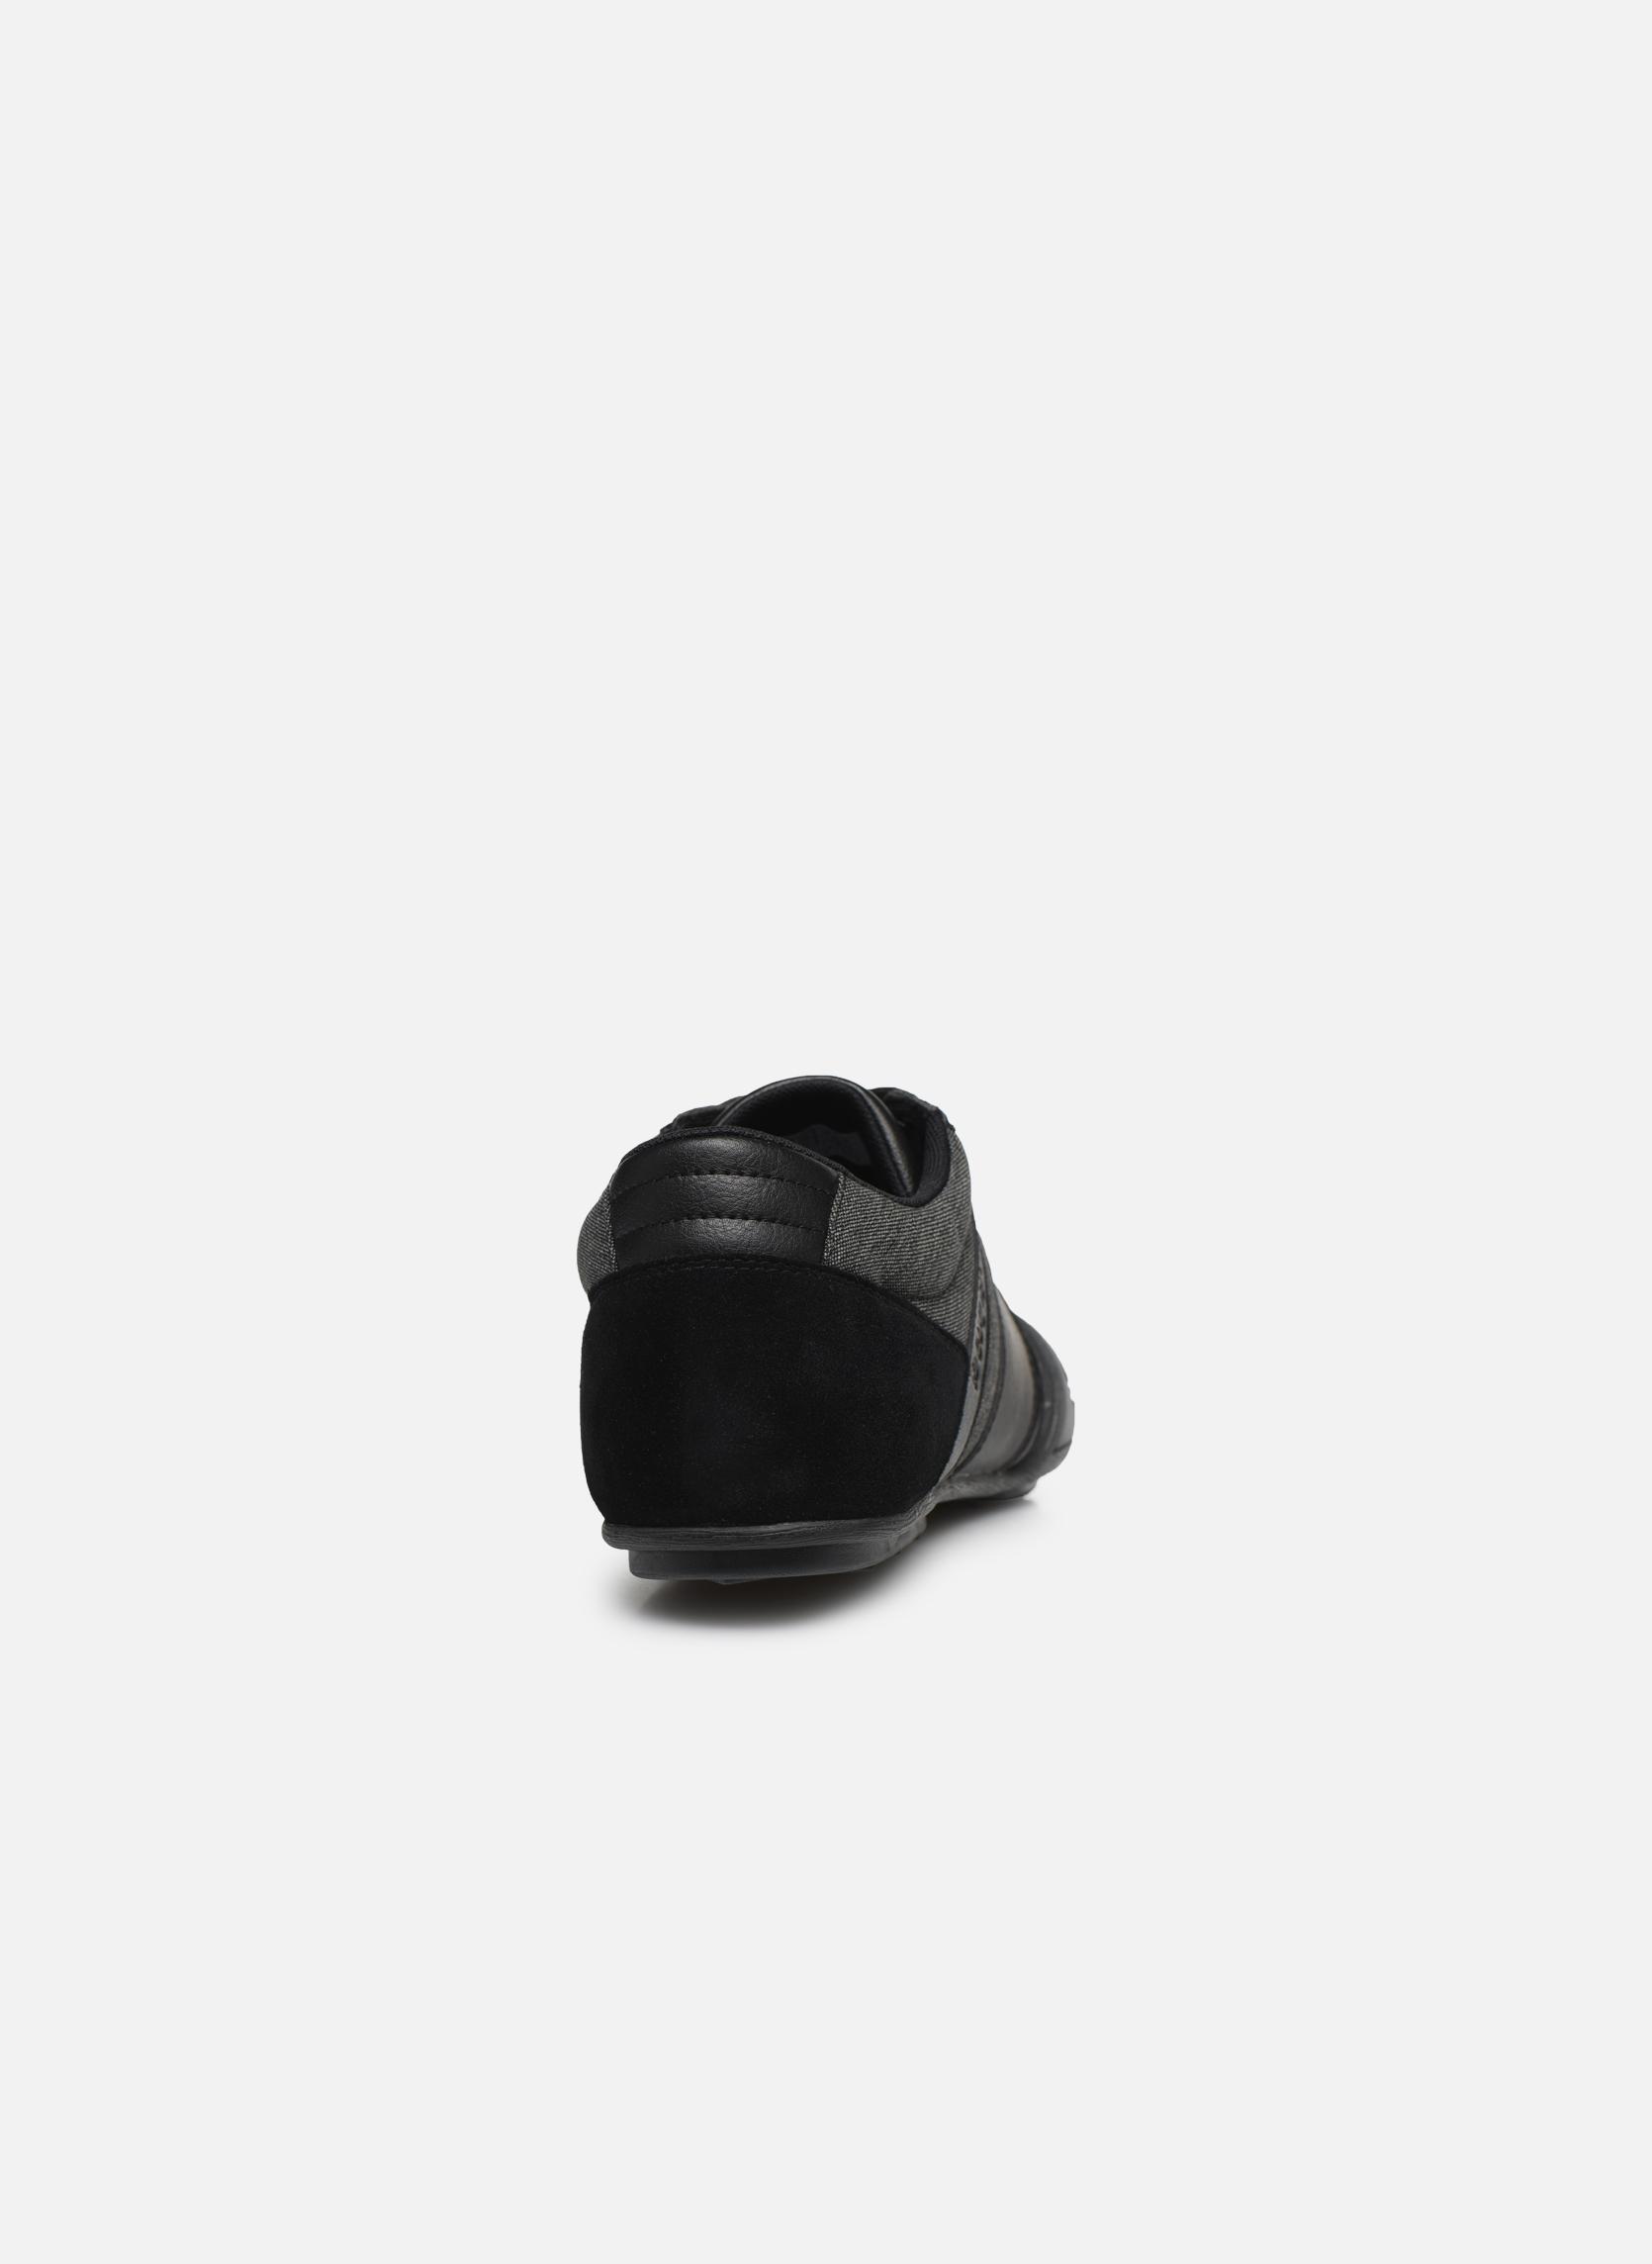 Andelot S Lea/Suede Black